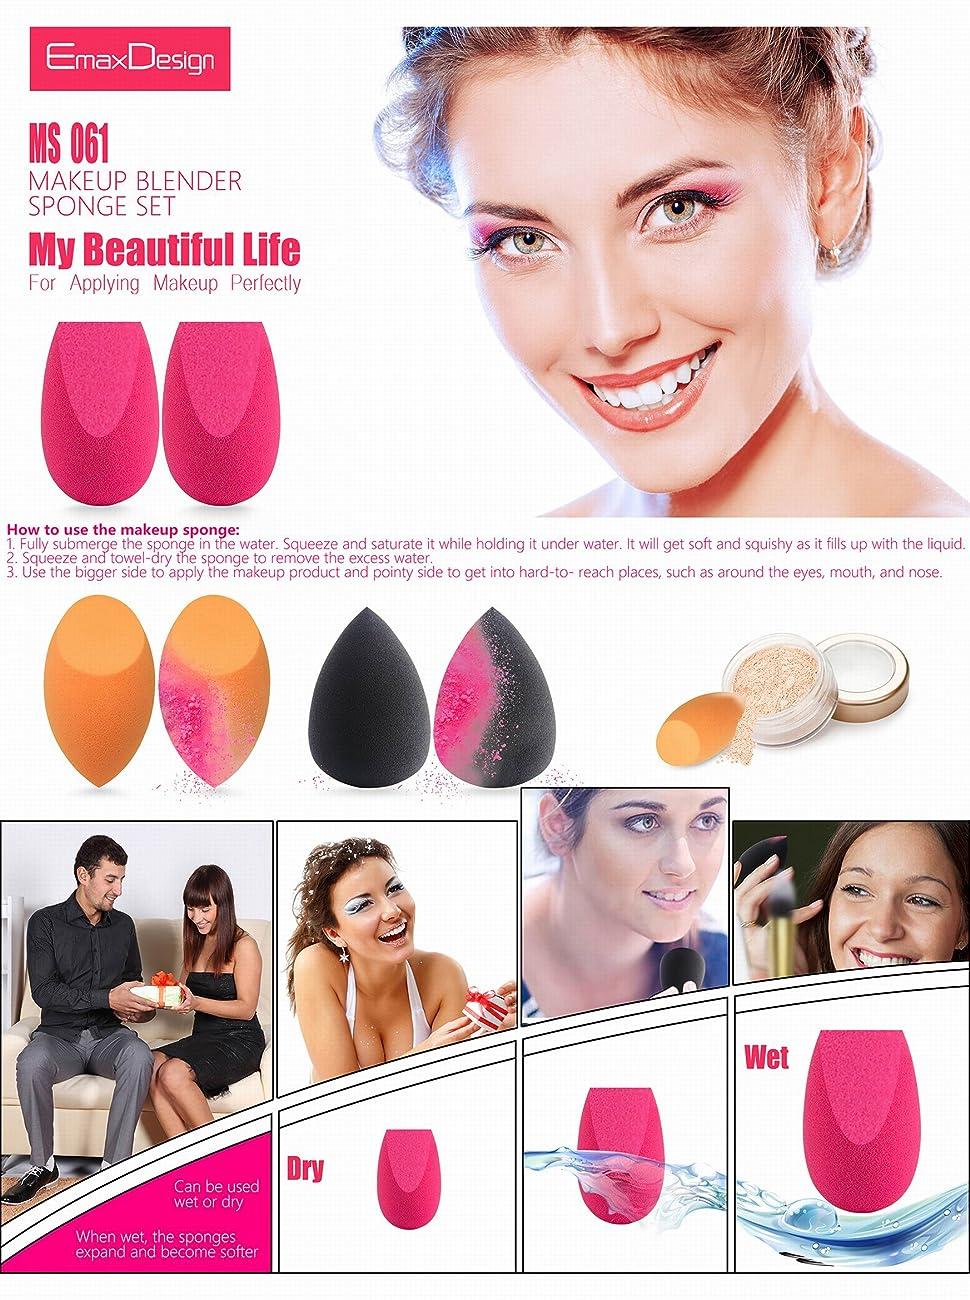 EmaxDesign Makeup Sponges, 6 Pieces Makeup Blender